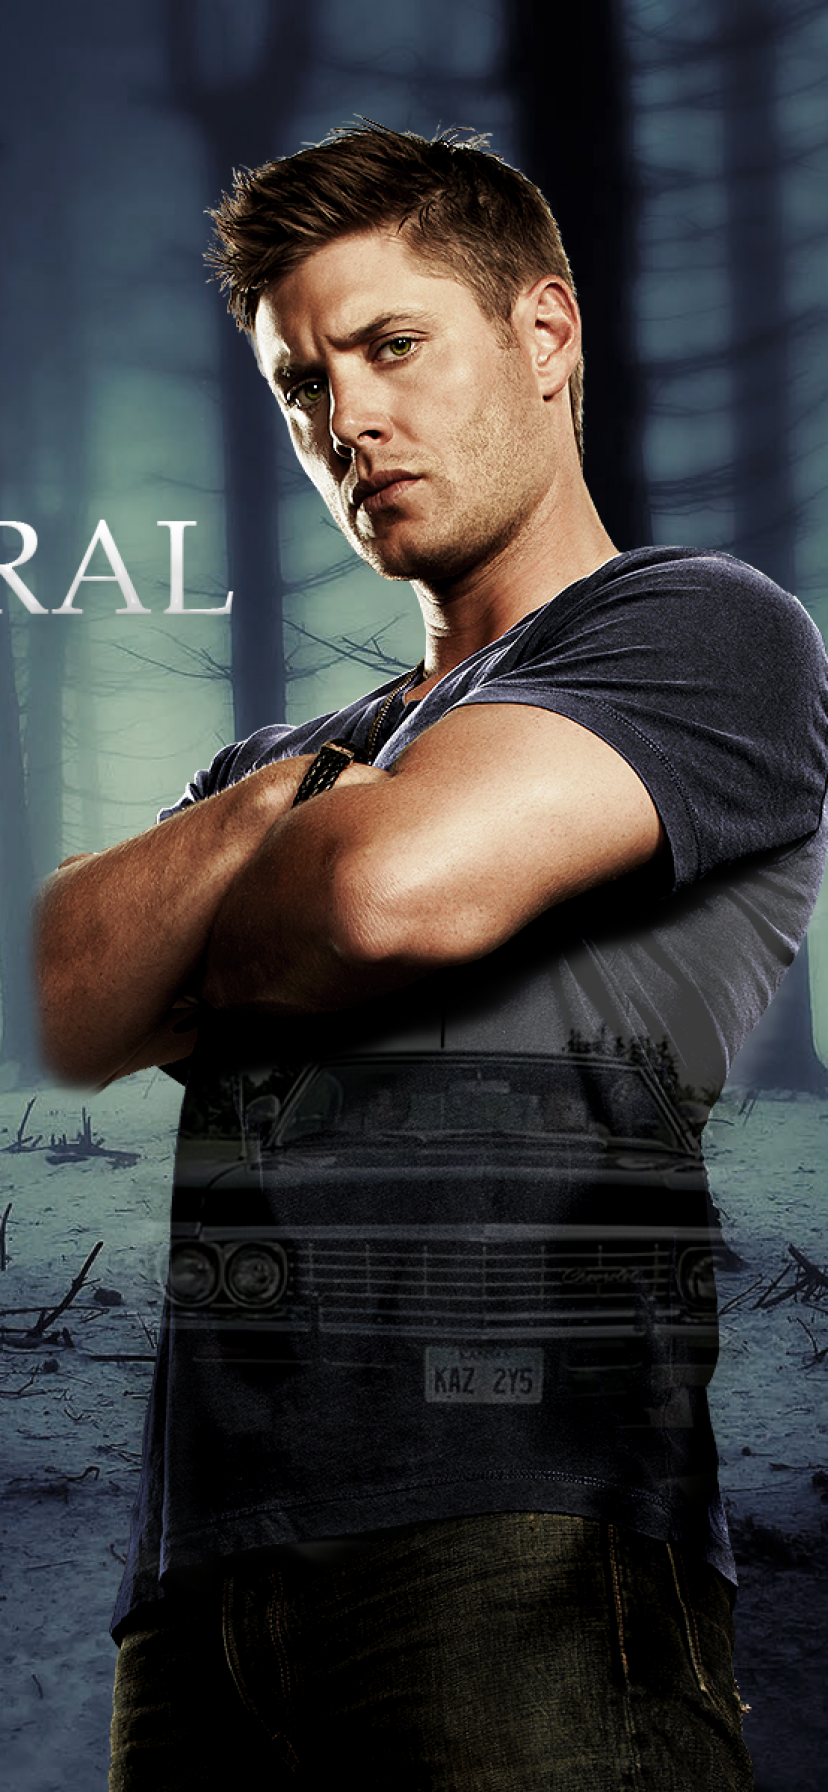 Iphone Xr Supernatural Wallpaper - Supernatural Season 6 , HD Wallpaper & Backgrounds